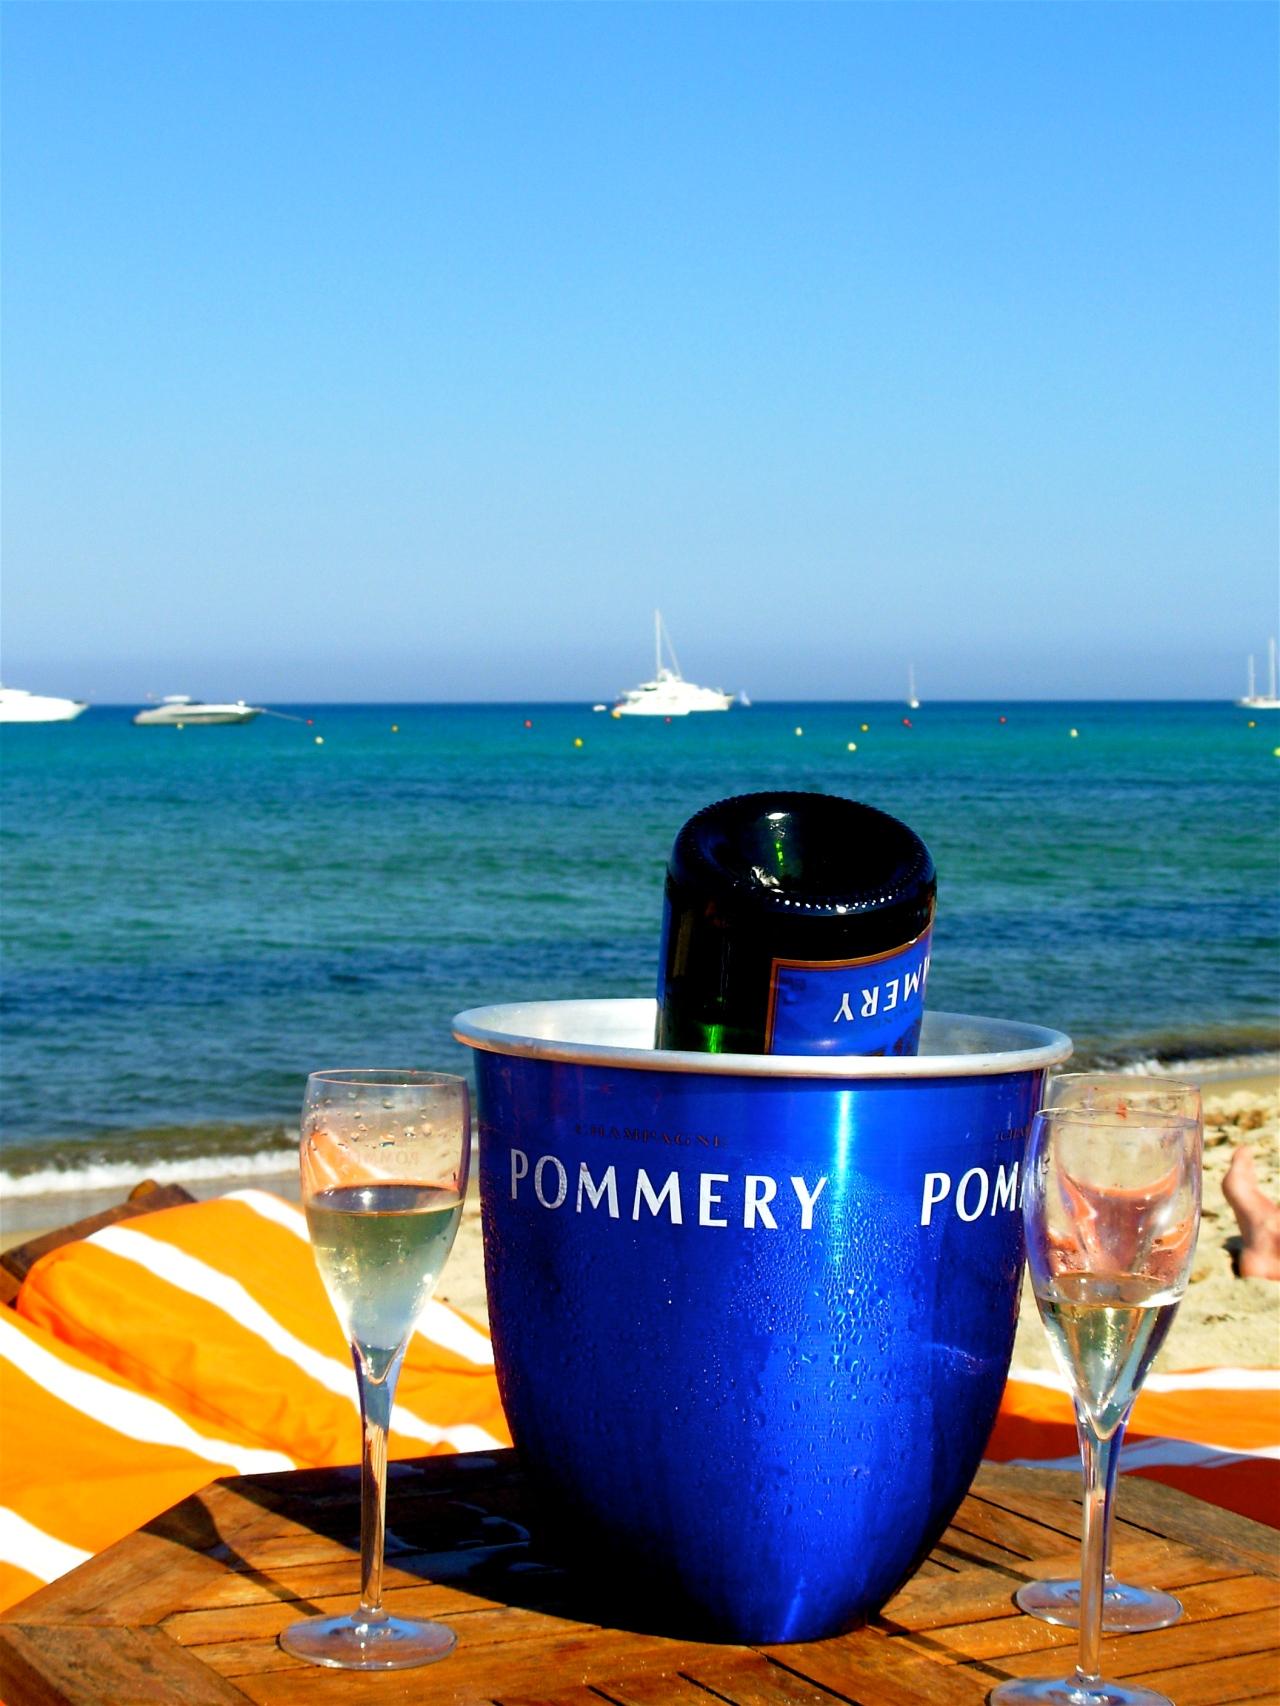 O dia está bom pra tomar champagne na praia em SaintTropez